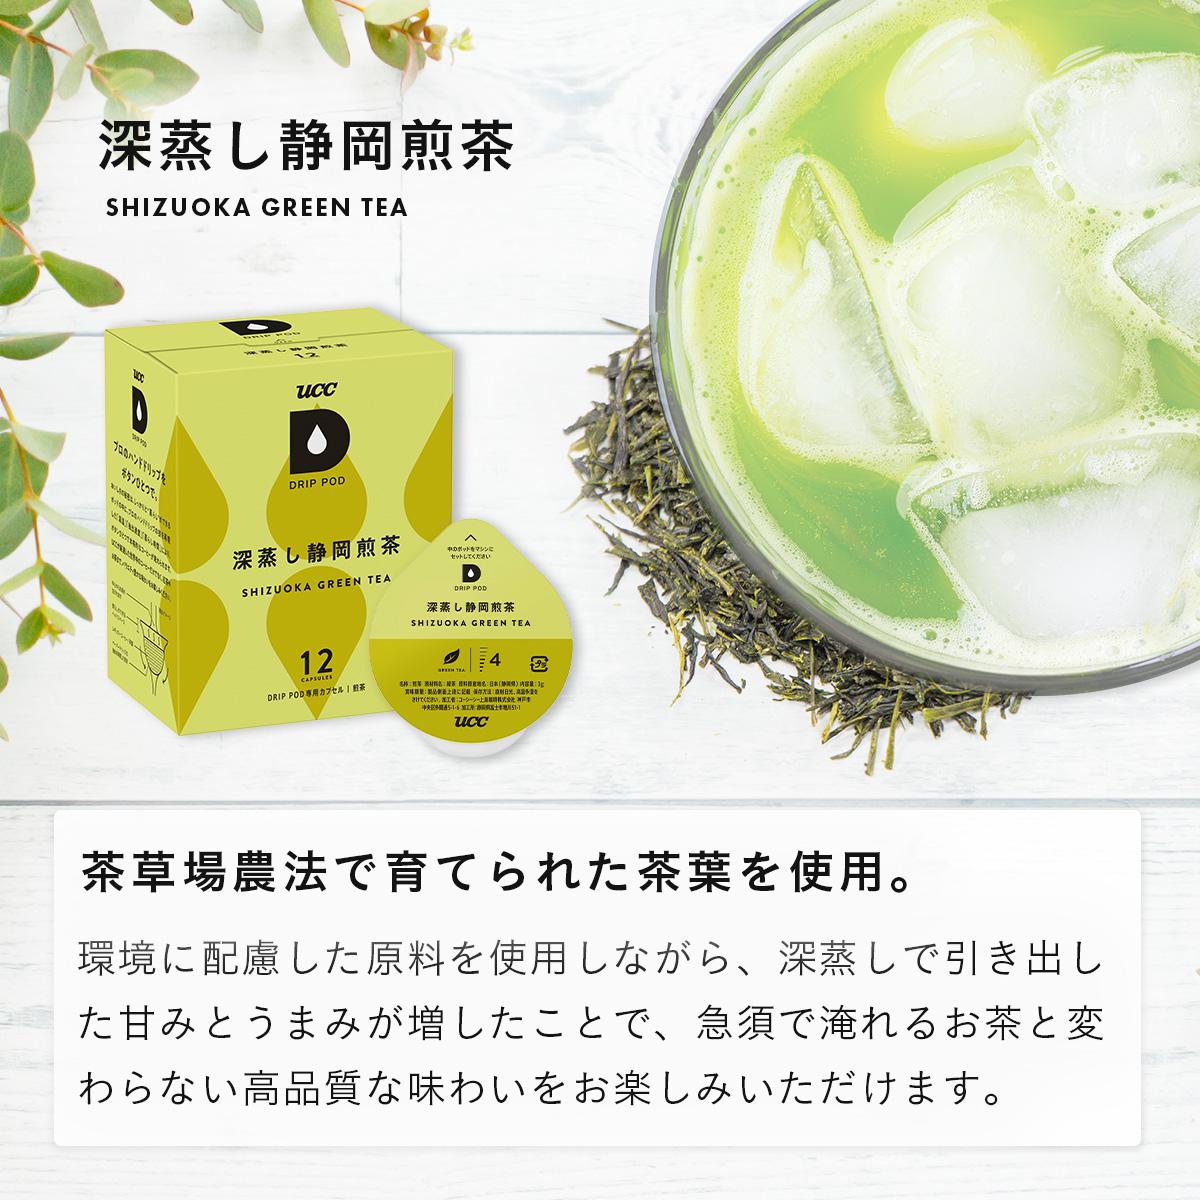 UCC  DRIP POD 深蒸し静岡煎茶【12P×12箱(144P入り)】